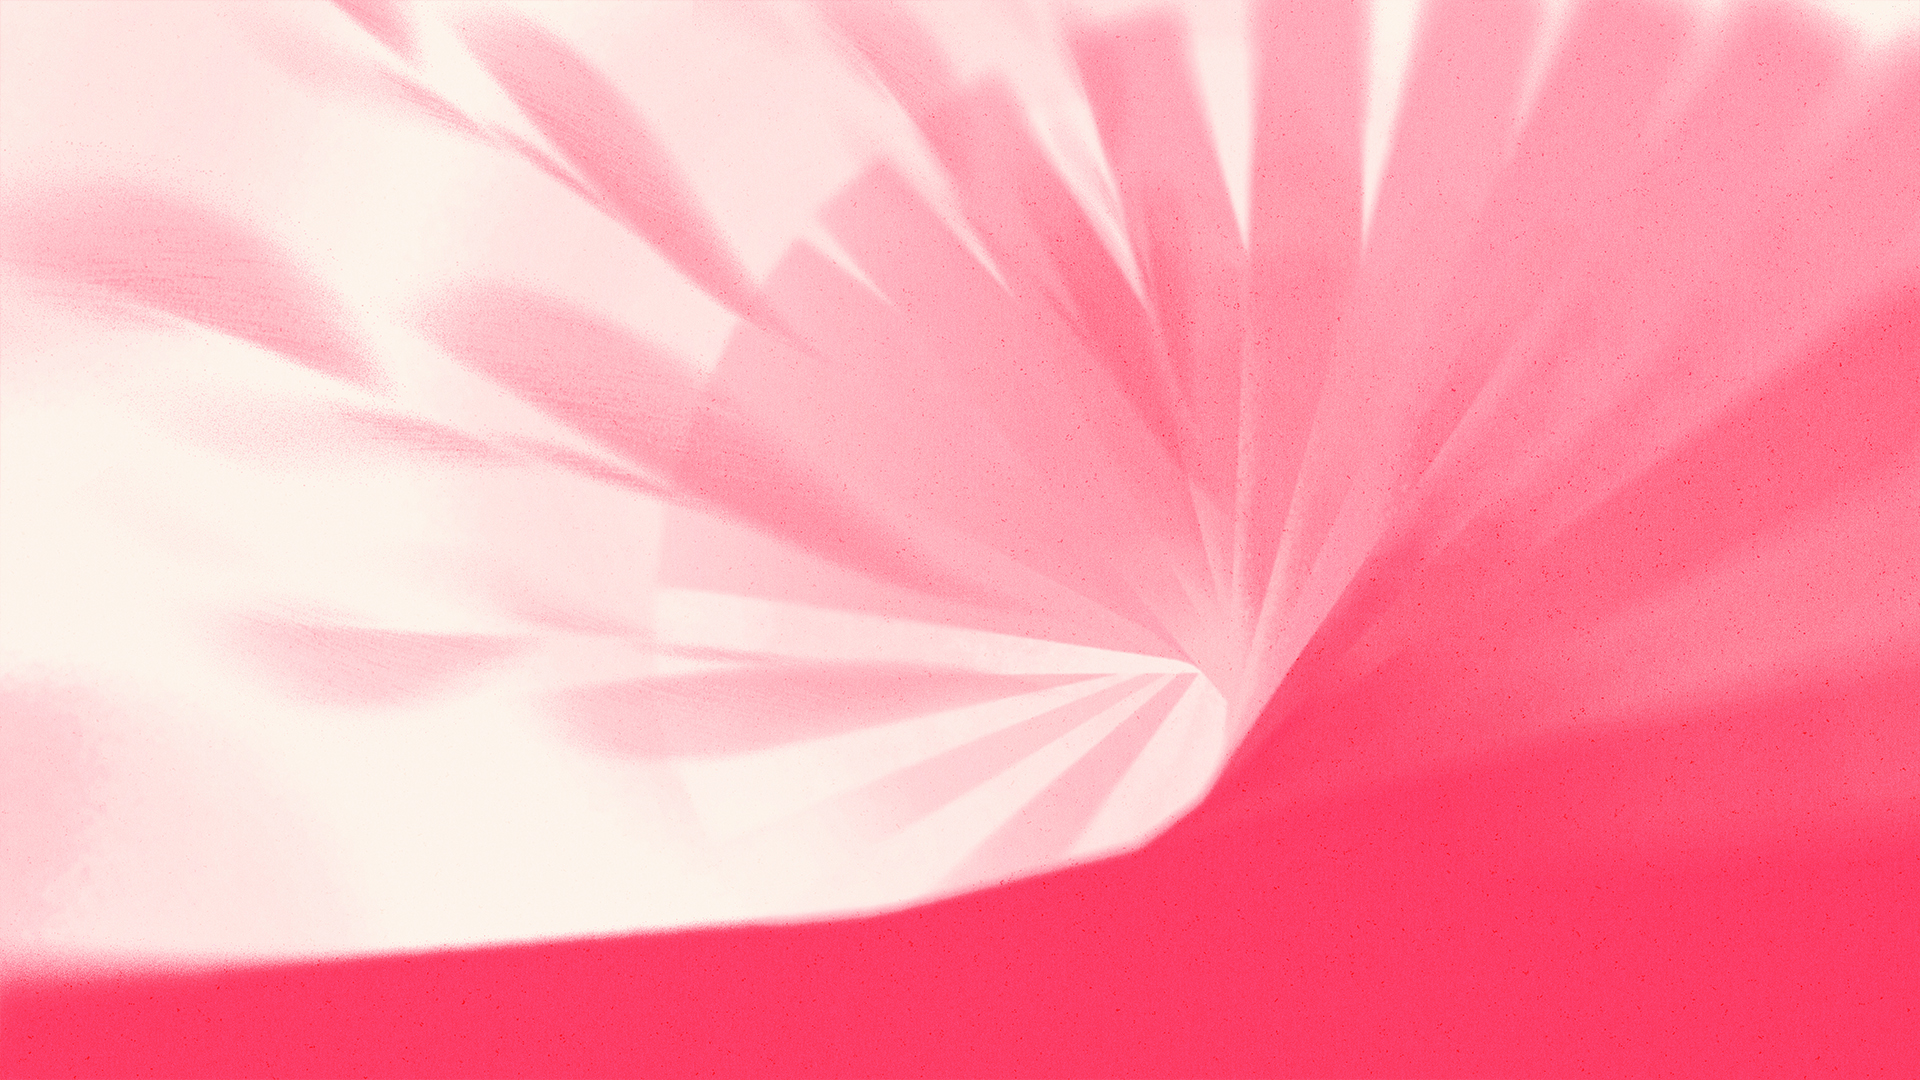 CNN17_01_Colorscope_s020B_Pink_Tunnel.jpg